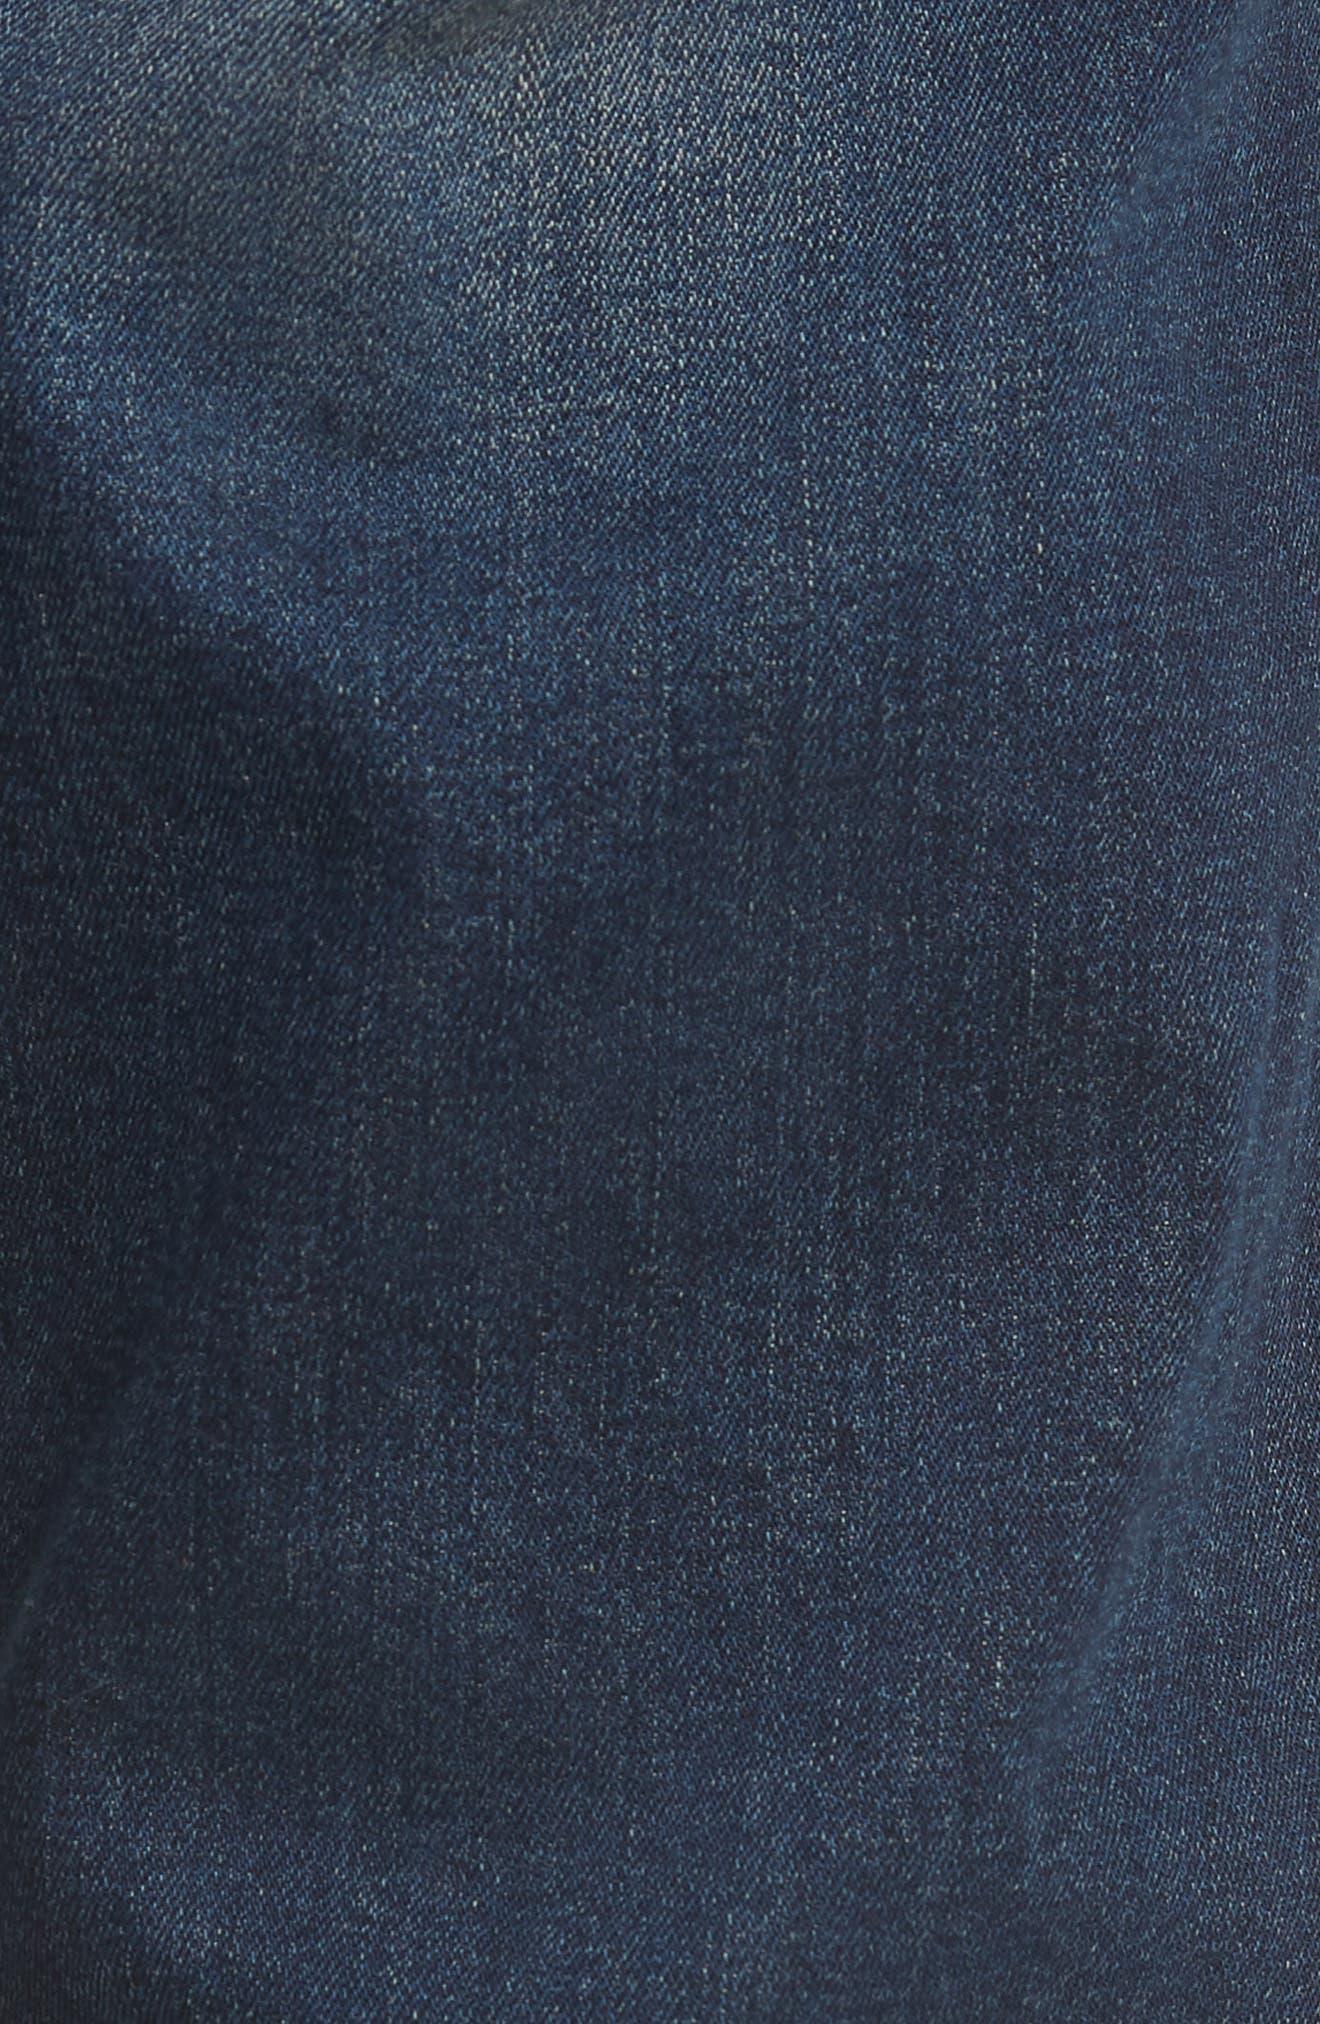 Delaware Slim Fit Jeans,                             Alternate thumbnail 5, color,                             Blue